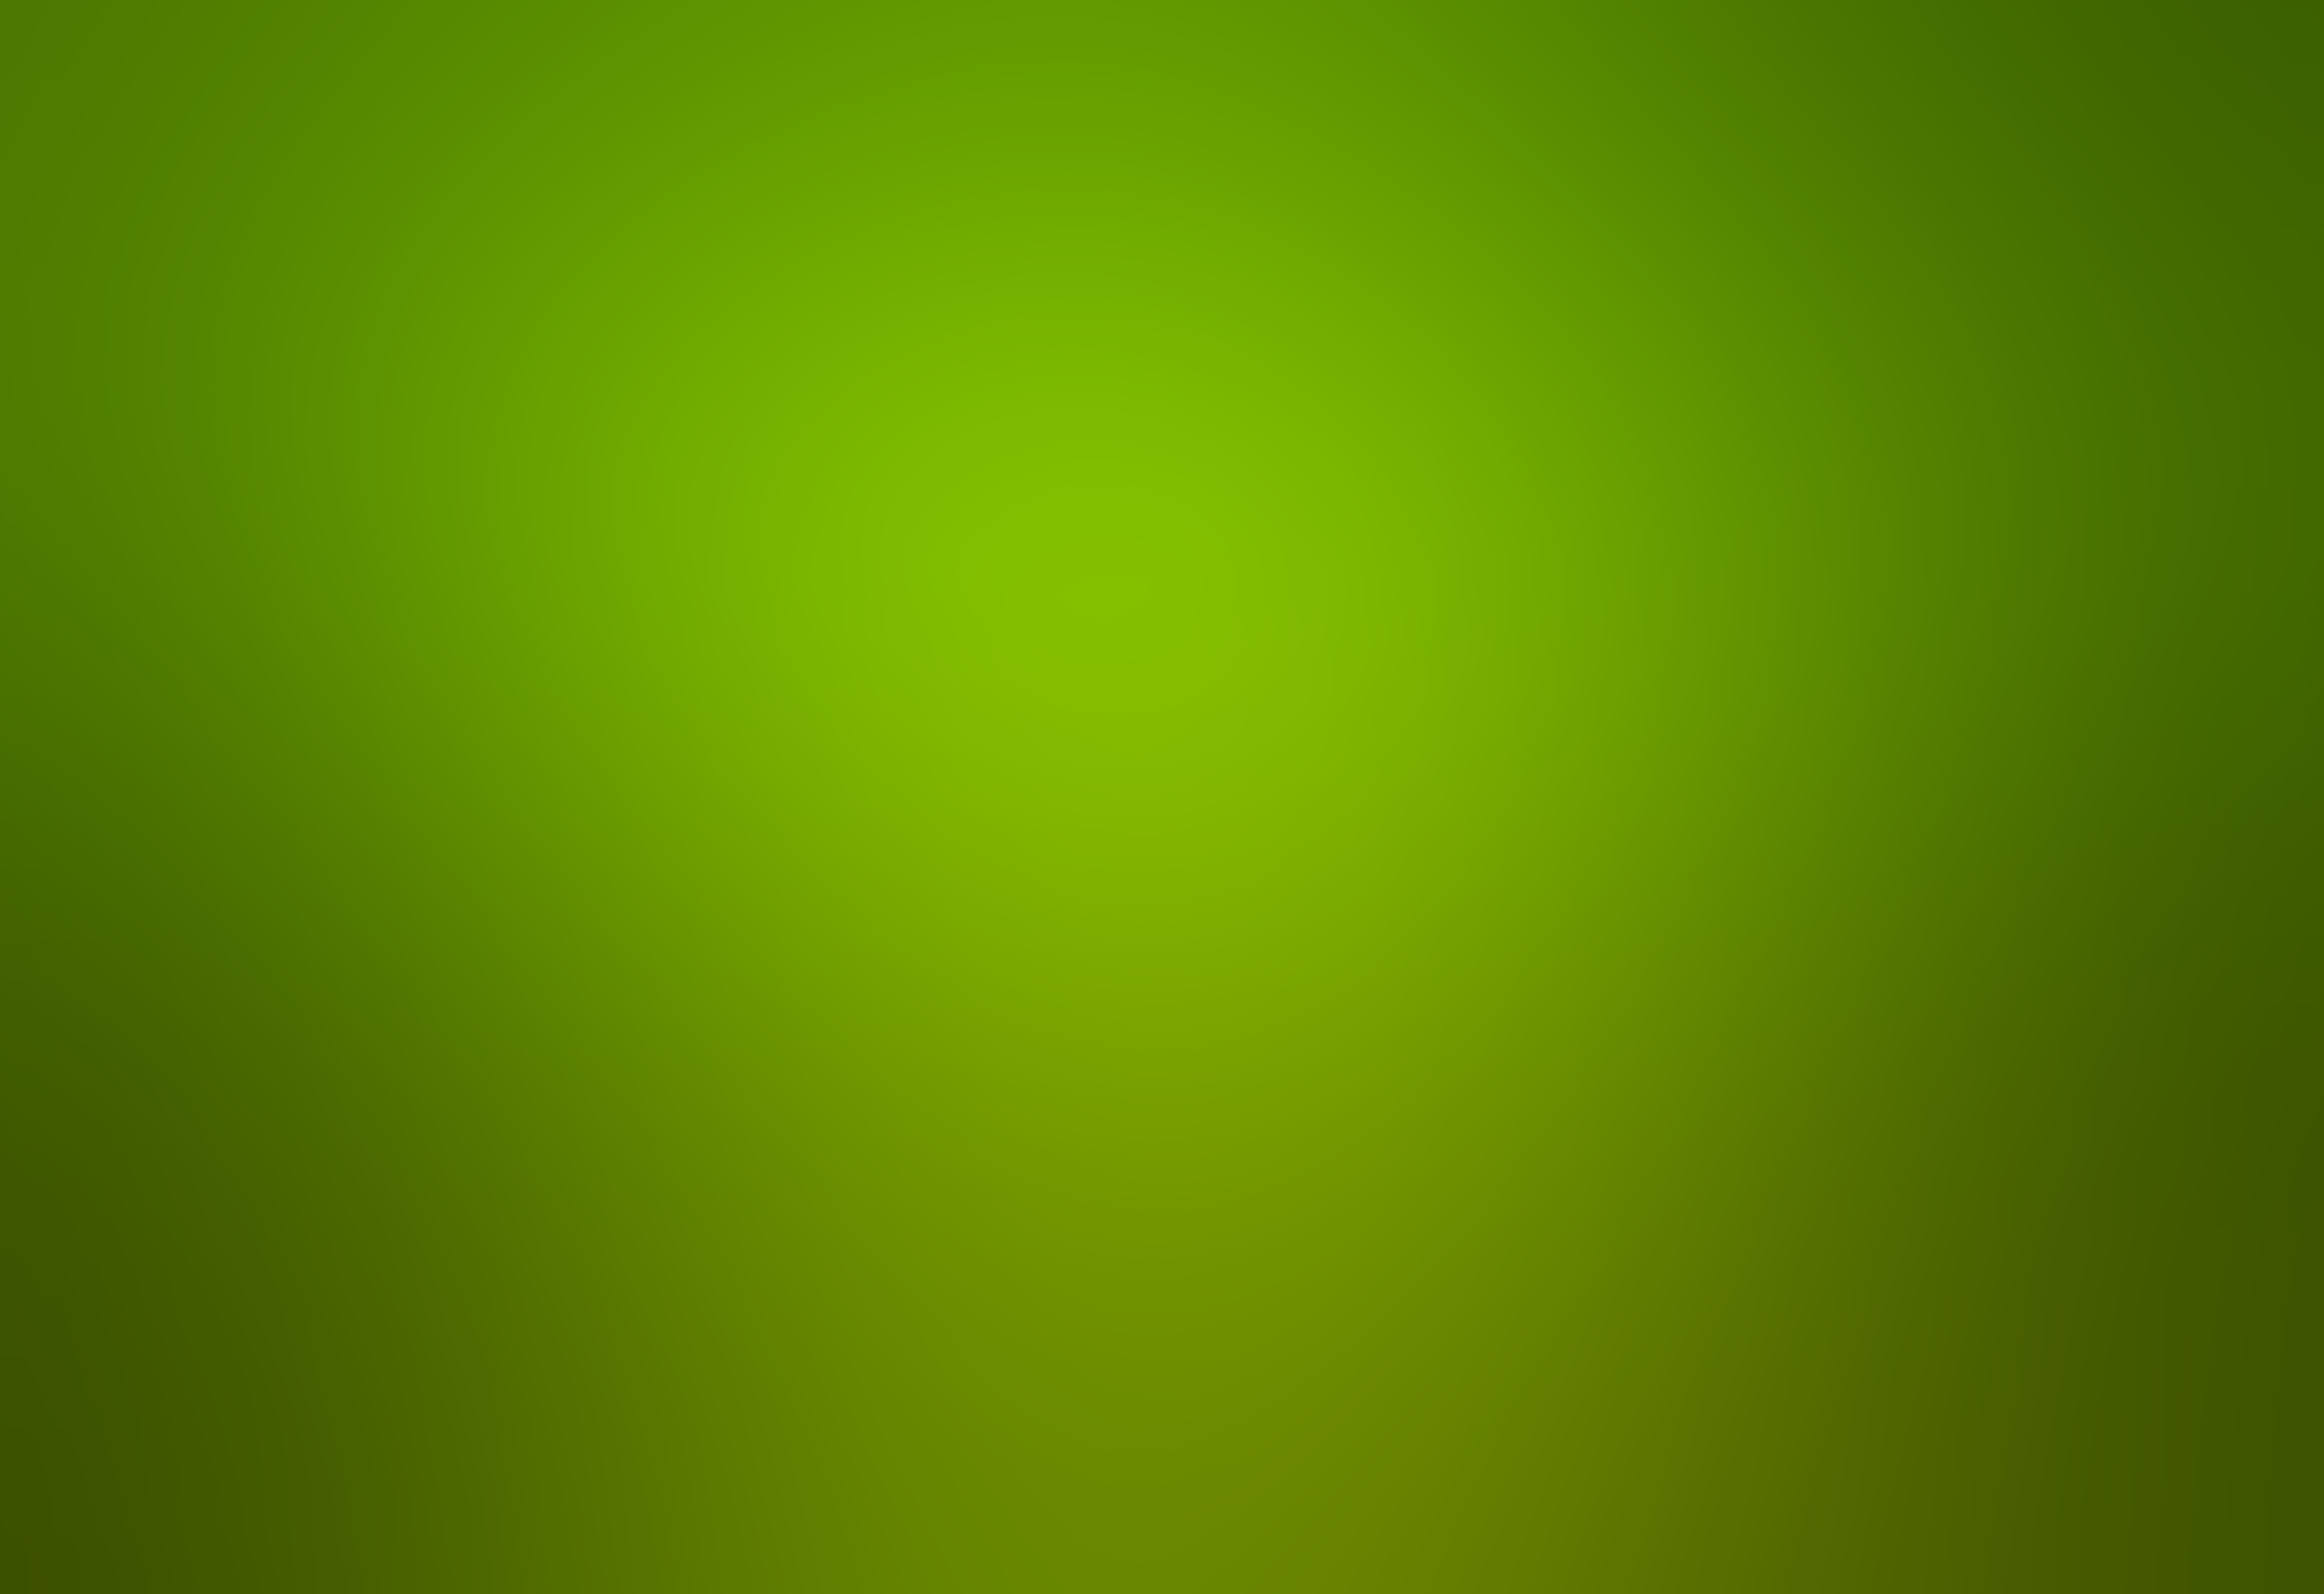 Light Green Blurred Background